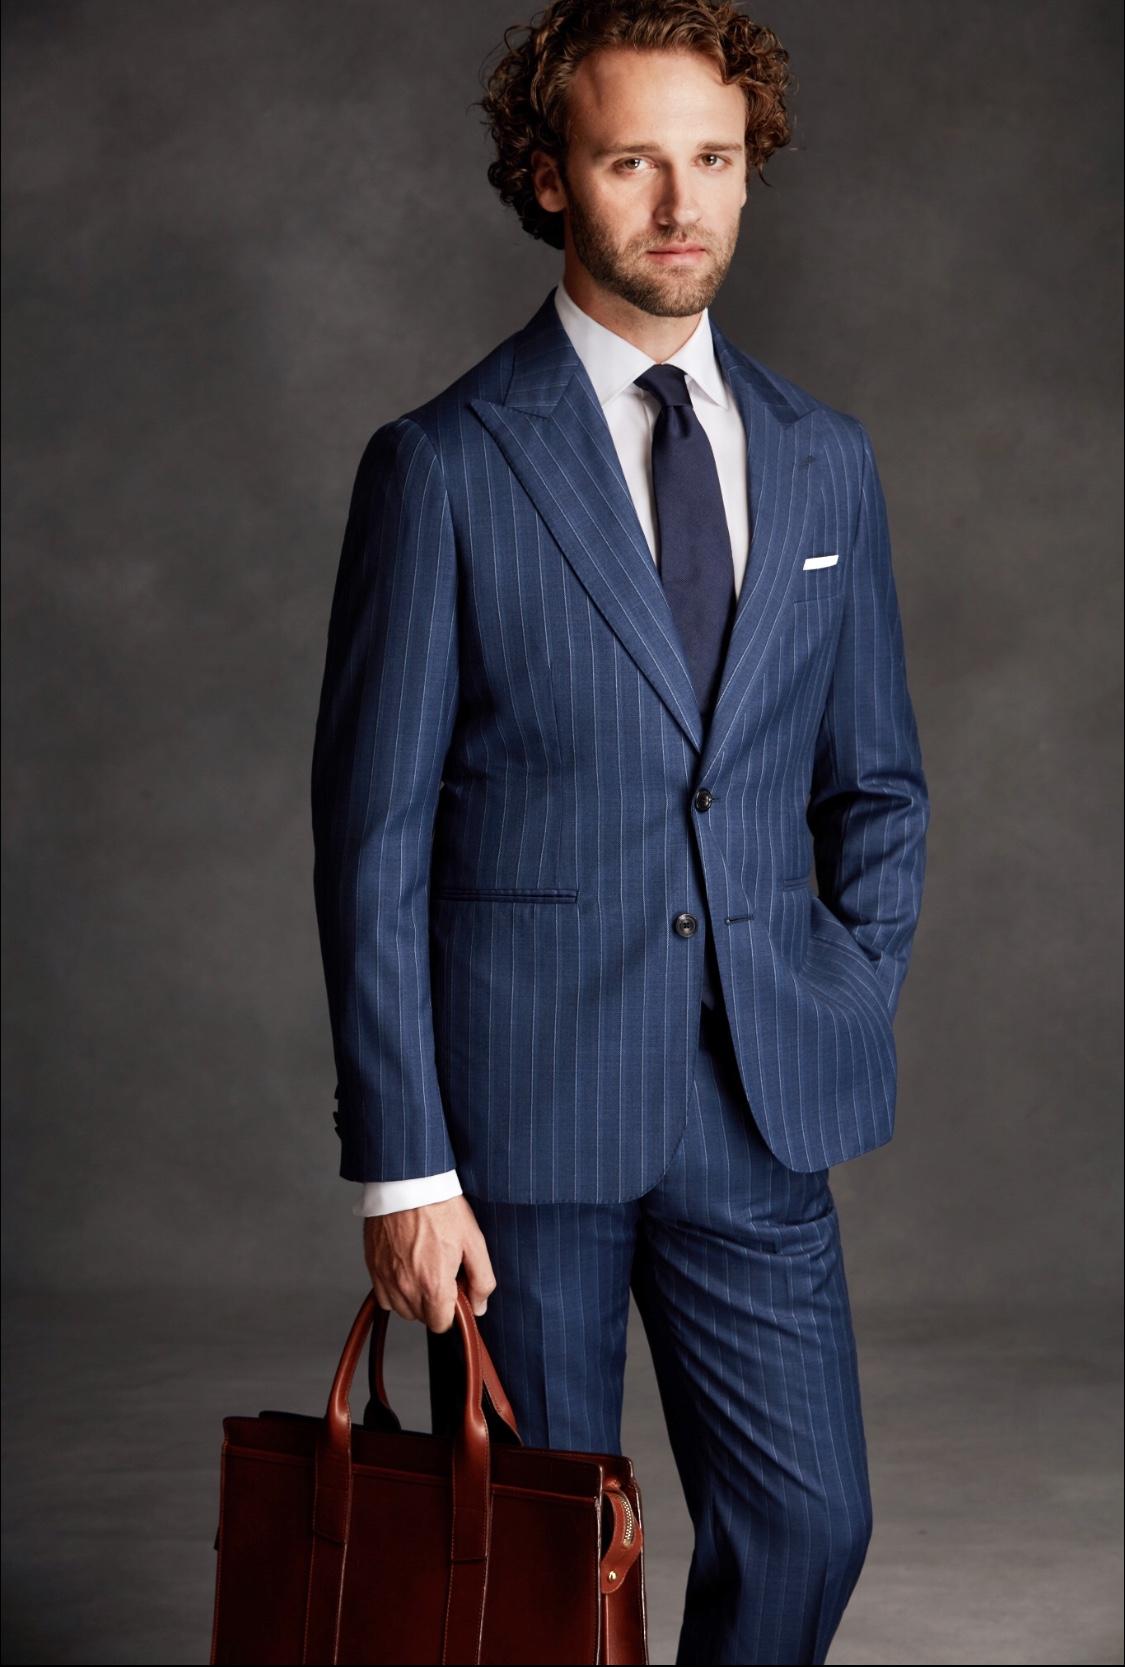 lawer in dark suit